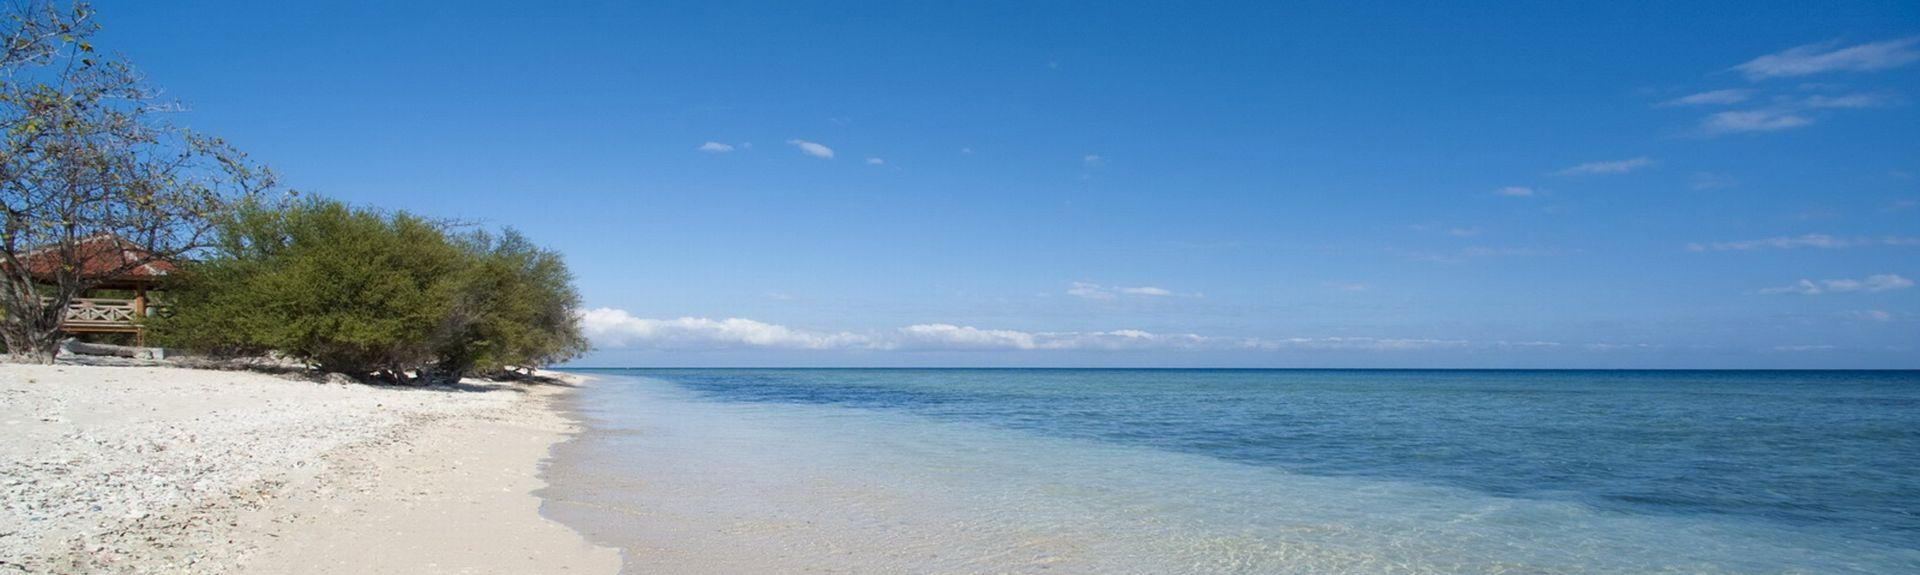 Senggigi Beach, Senggigi, West Nusa Tenggara, Indonesia